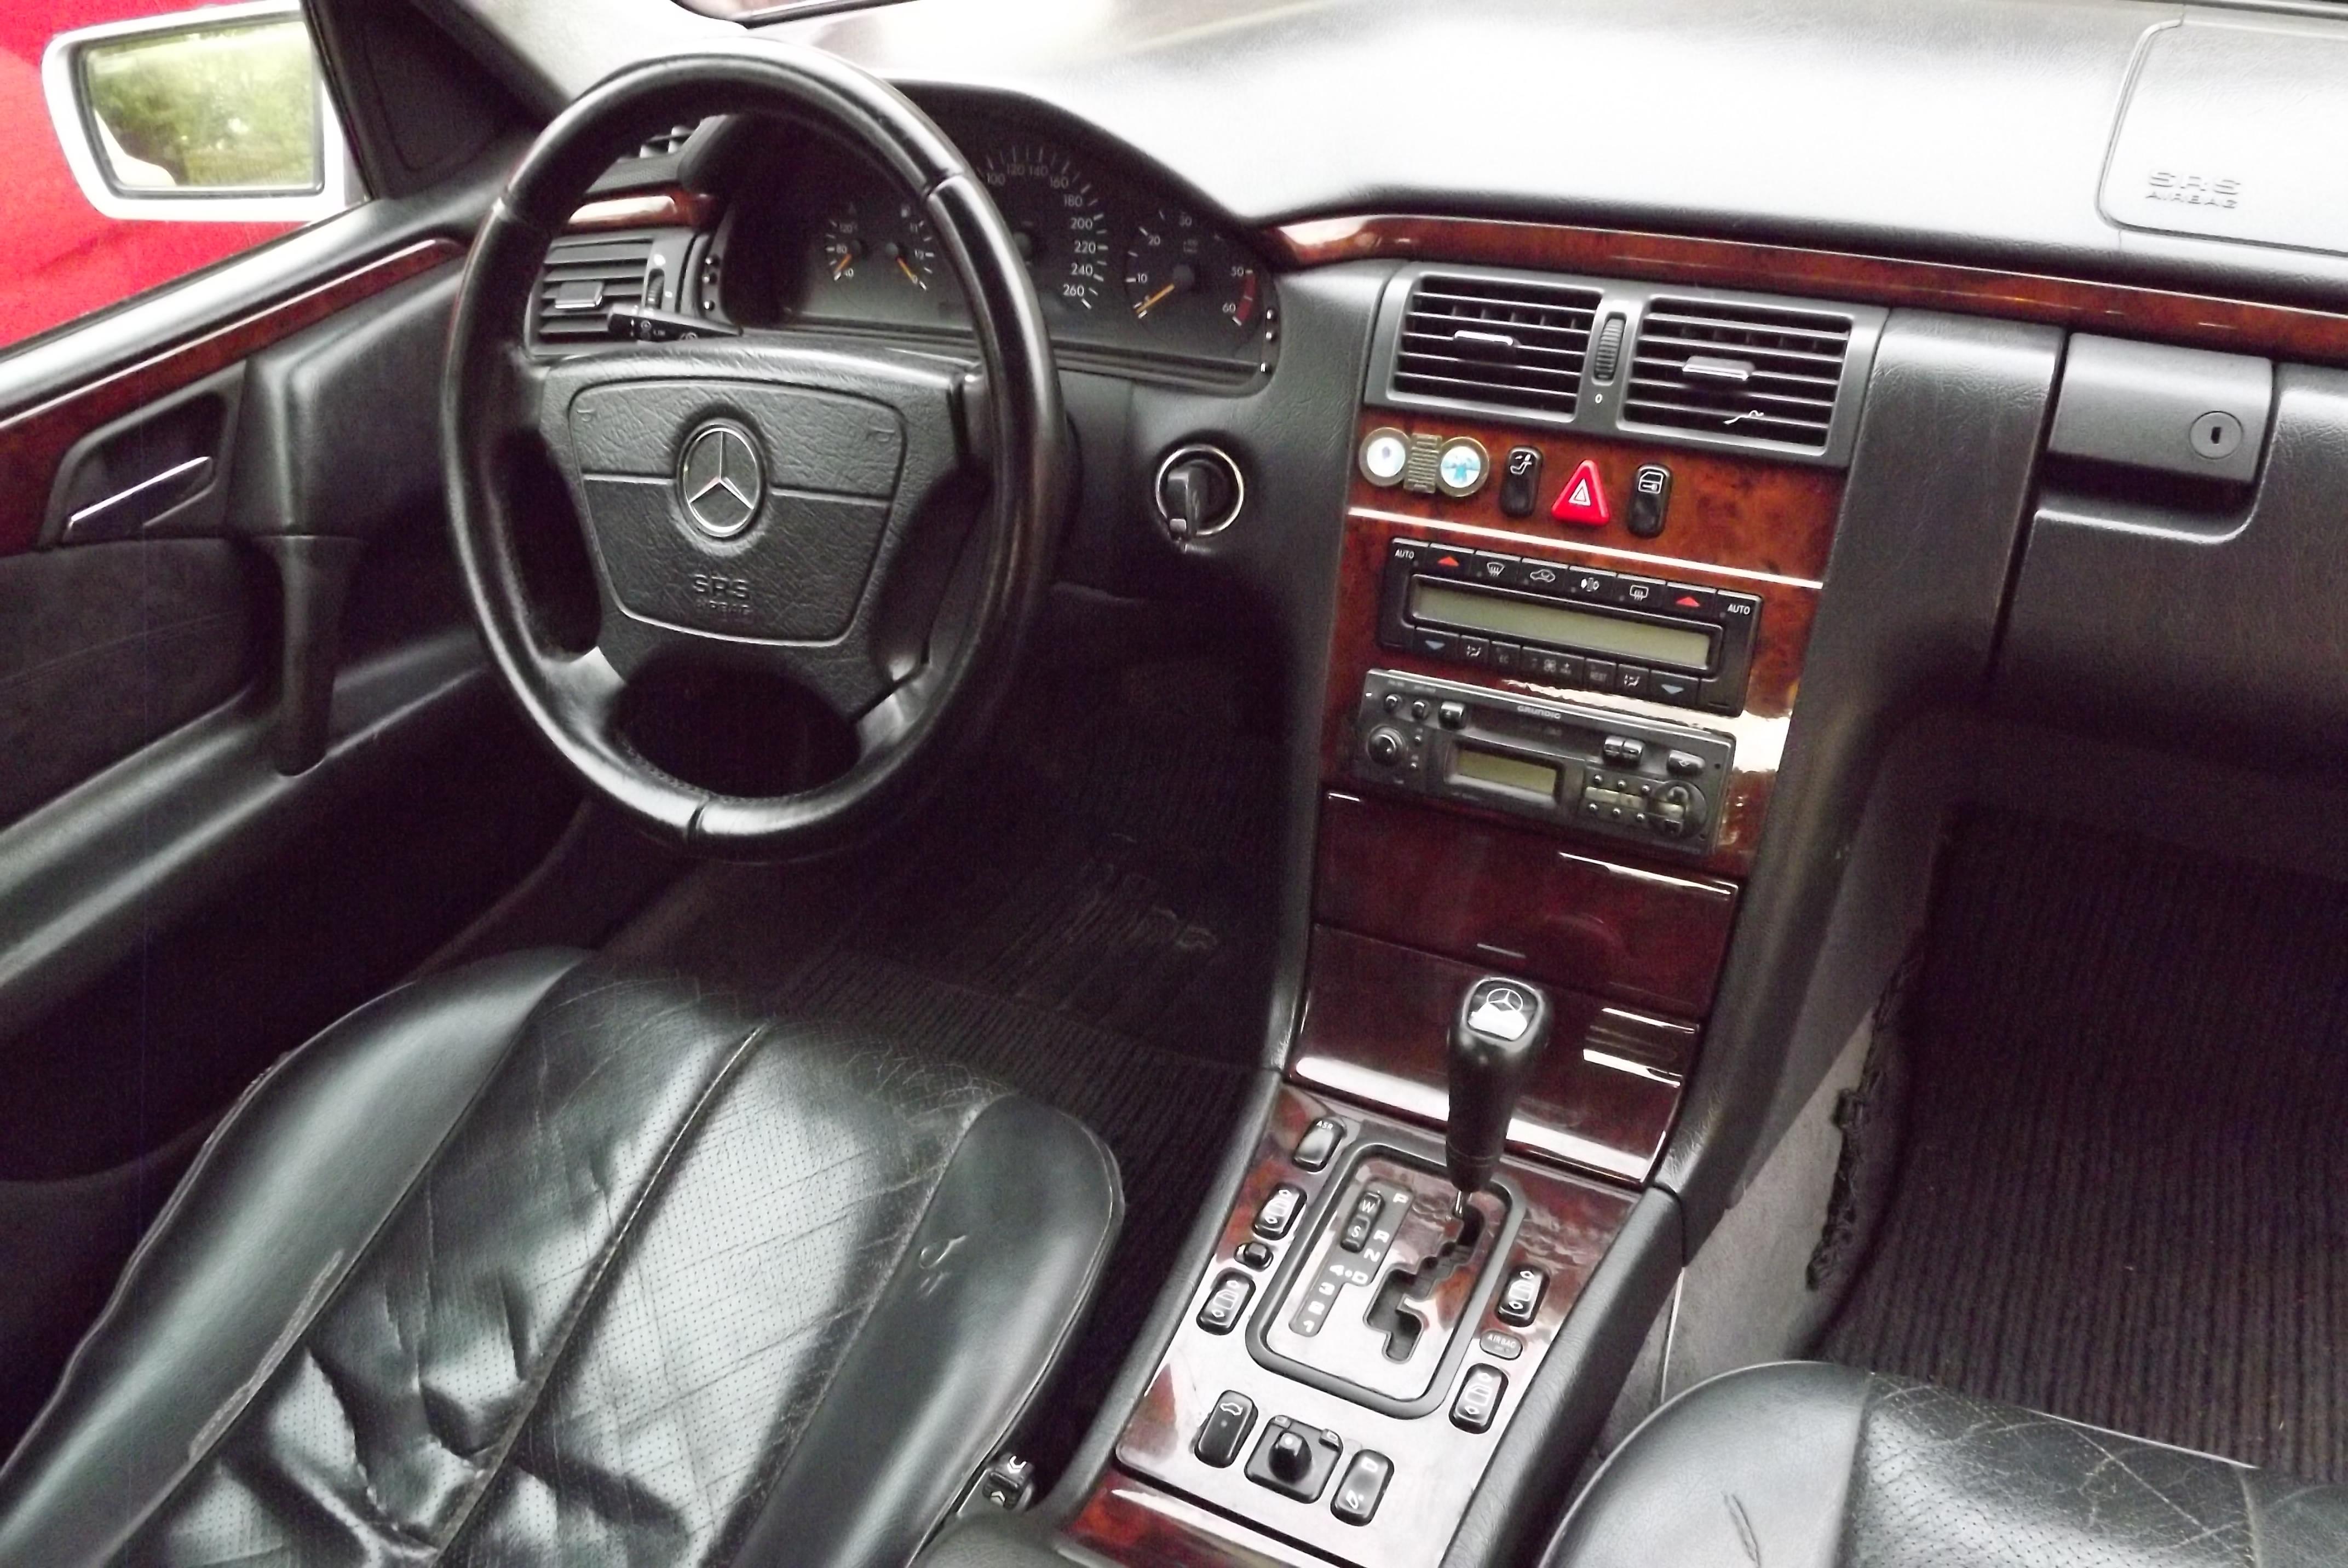 Внутренние компоненти кузова W210